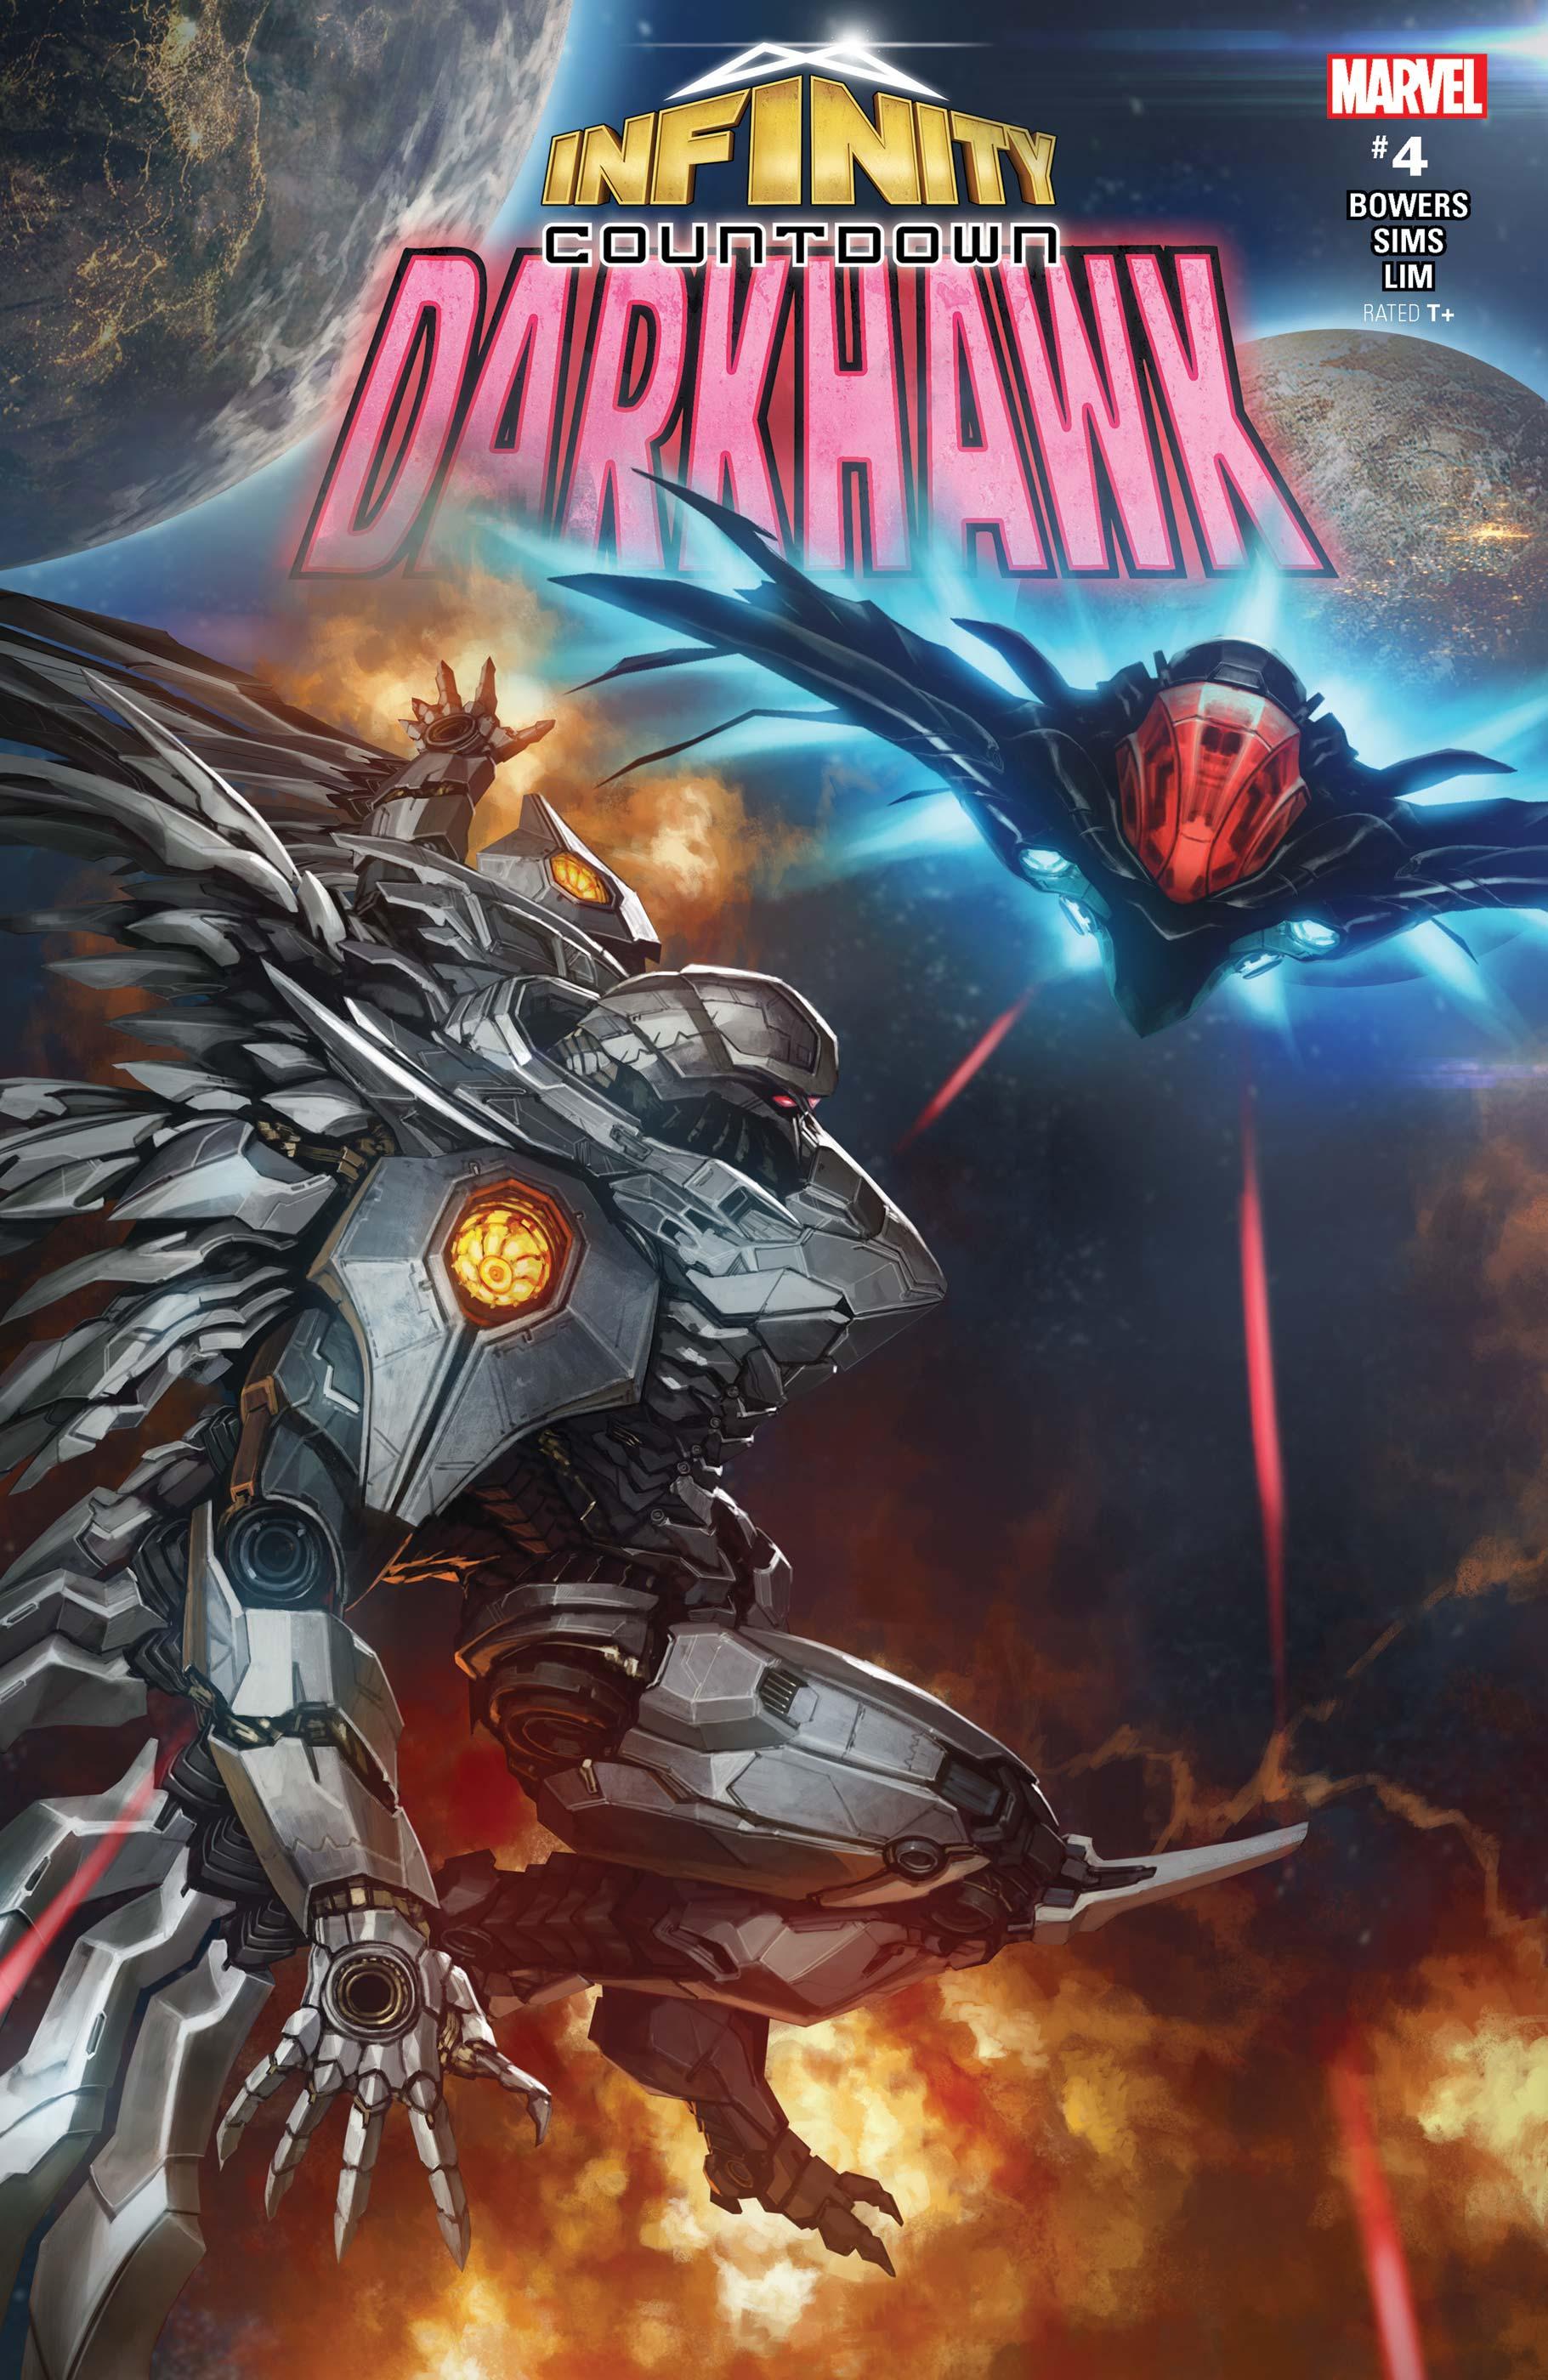 Infinity Countdown: Darkhawk (2018) #4